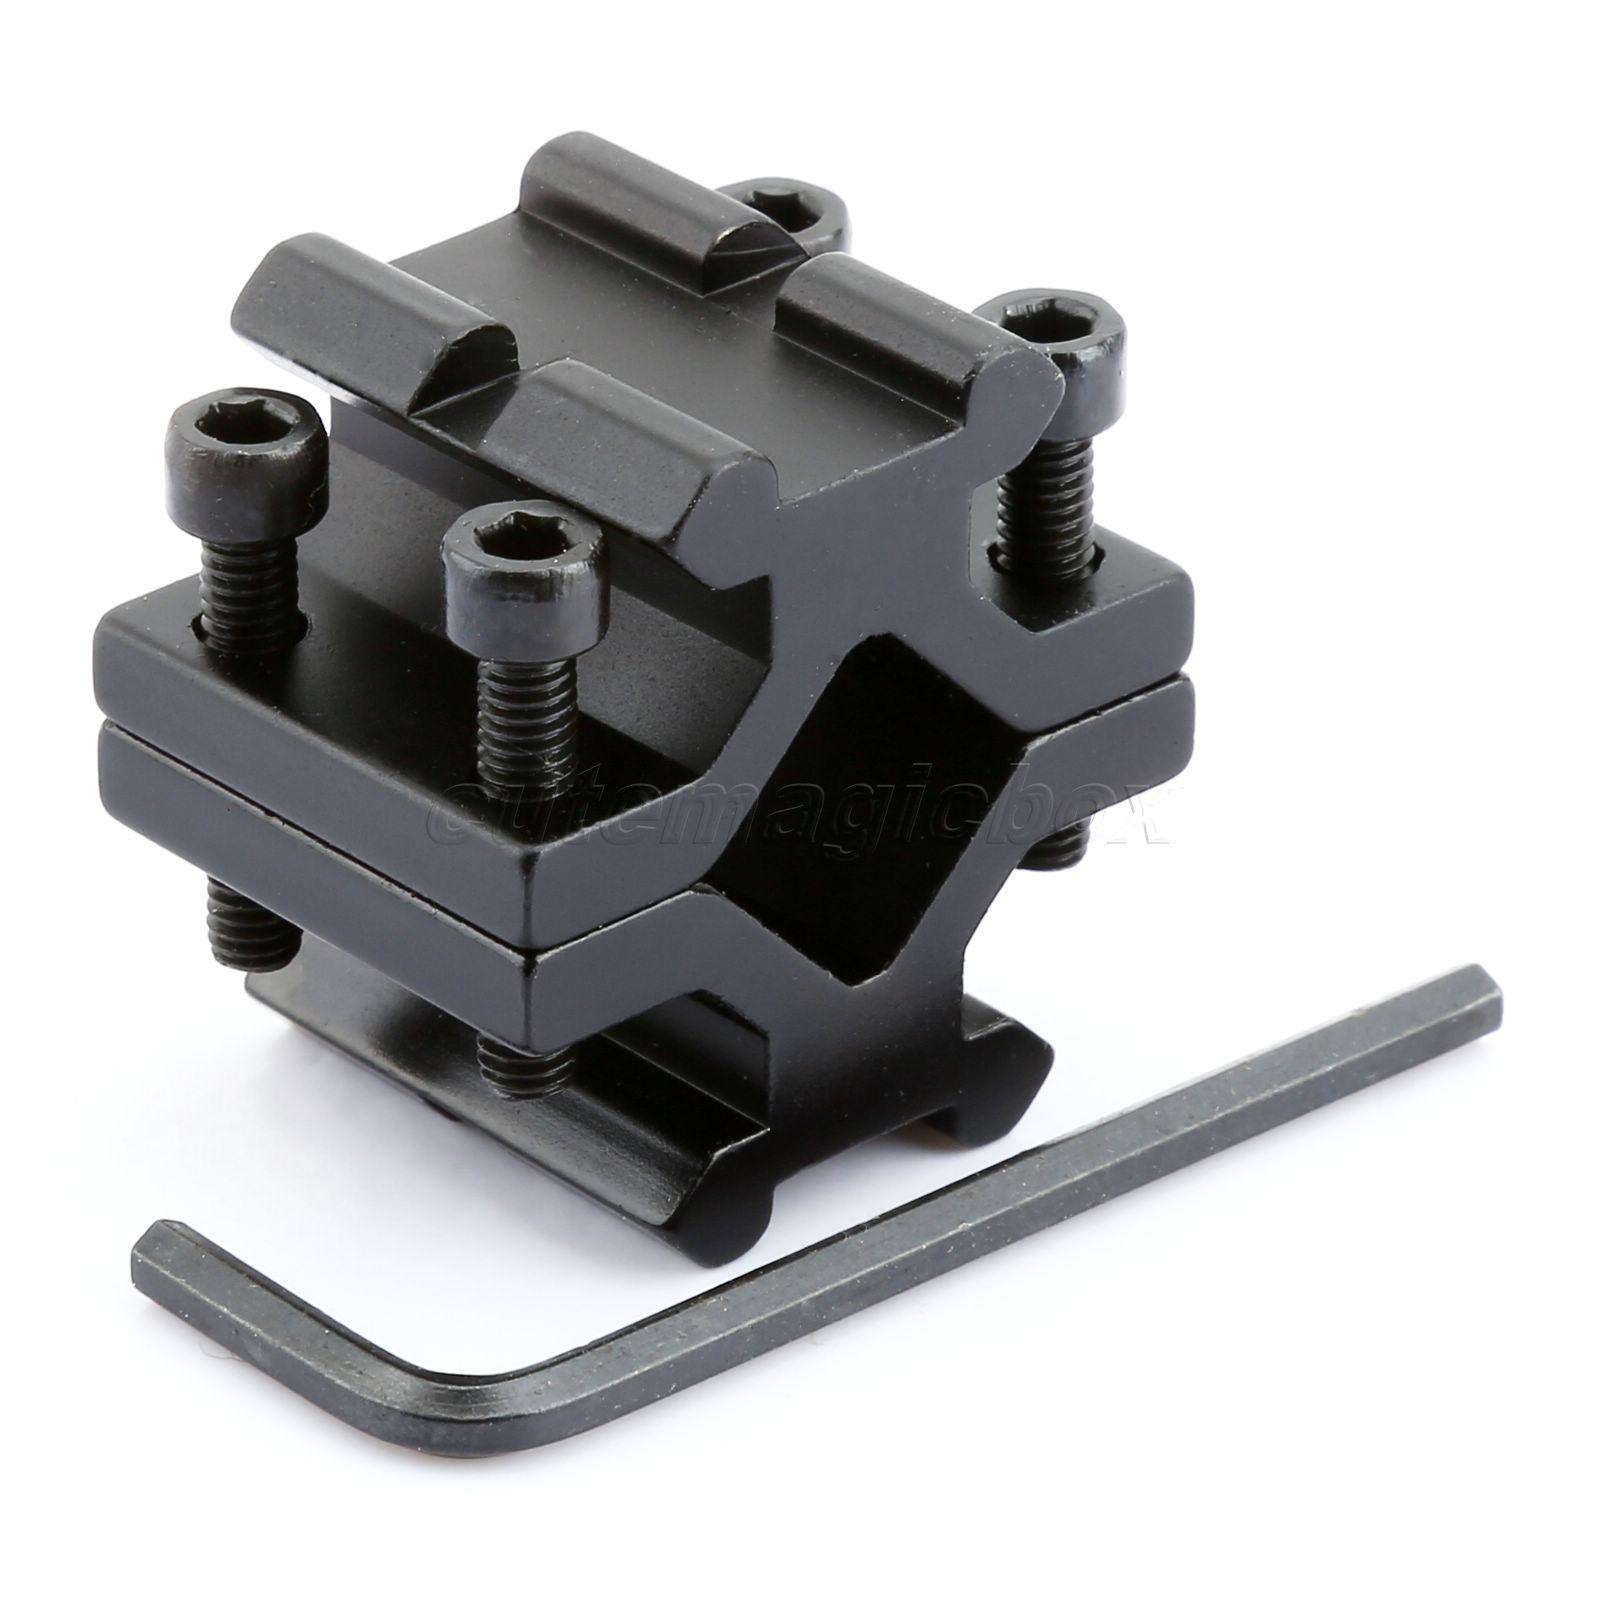 Universal Adjustable Rail 20mm Picatinny//Weaver Barrel Mount Bipod Adapter